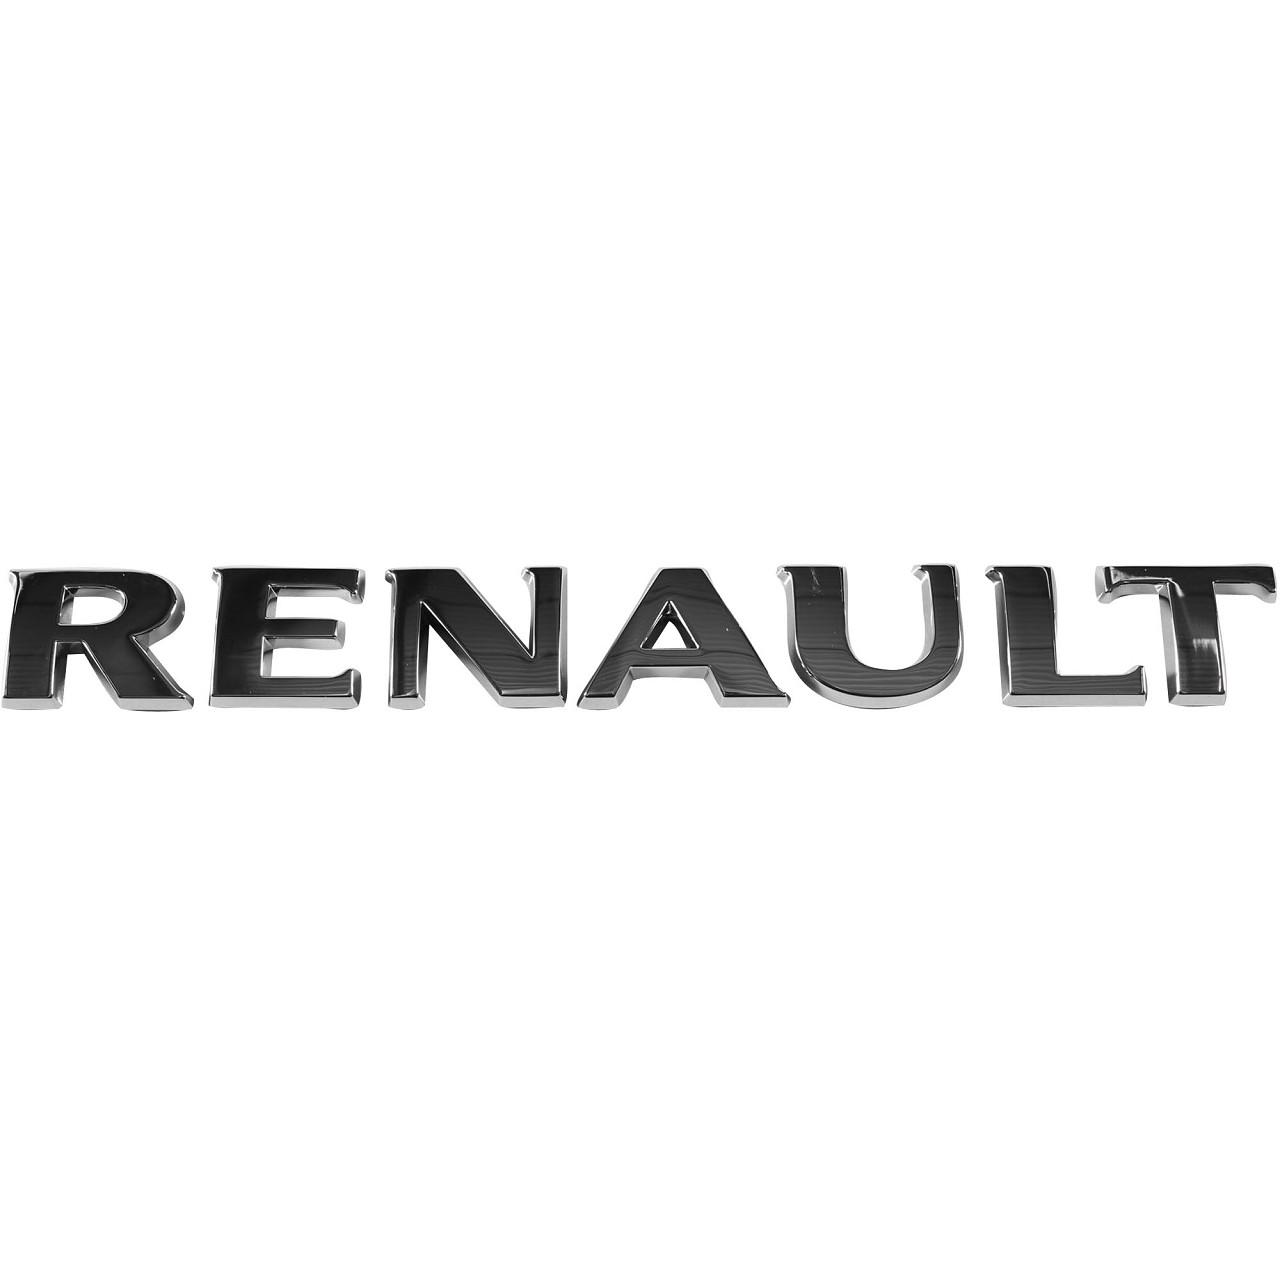 ORIGINAL Renault Emblem Logo Plakette Schriftzug Heckklappe 8200484897